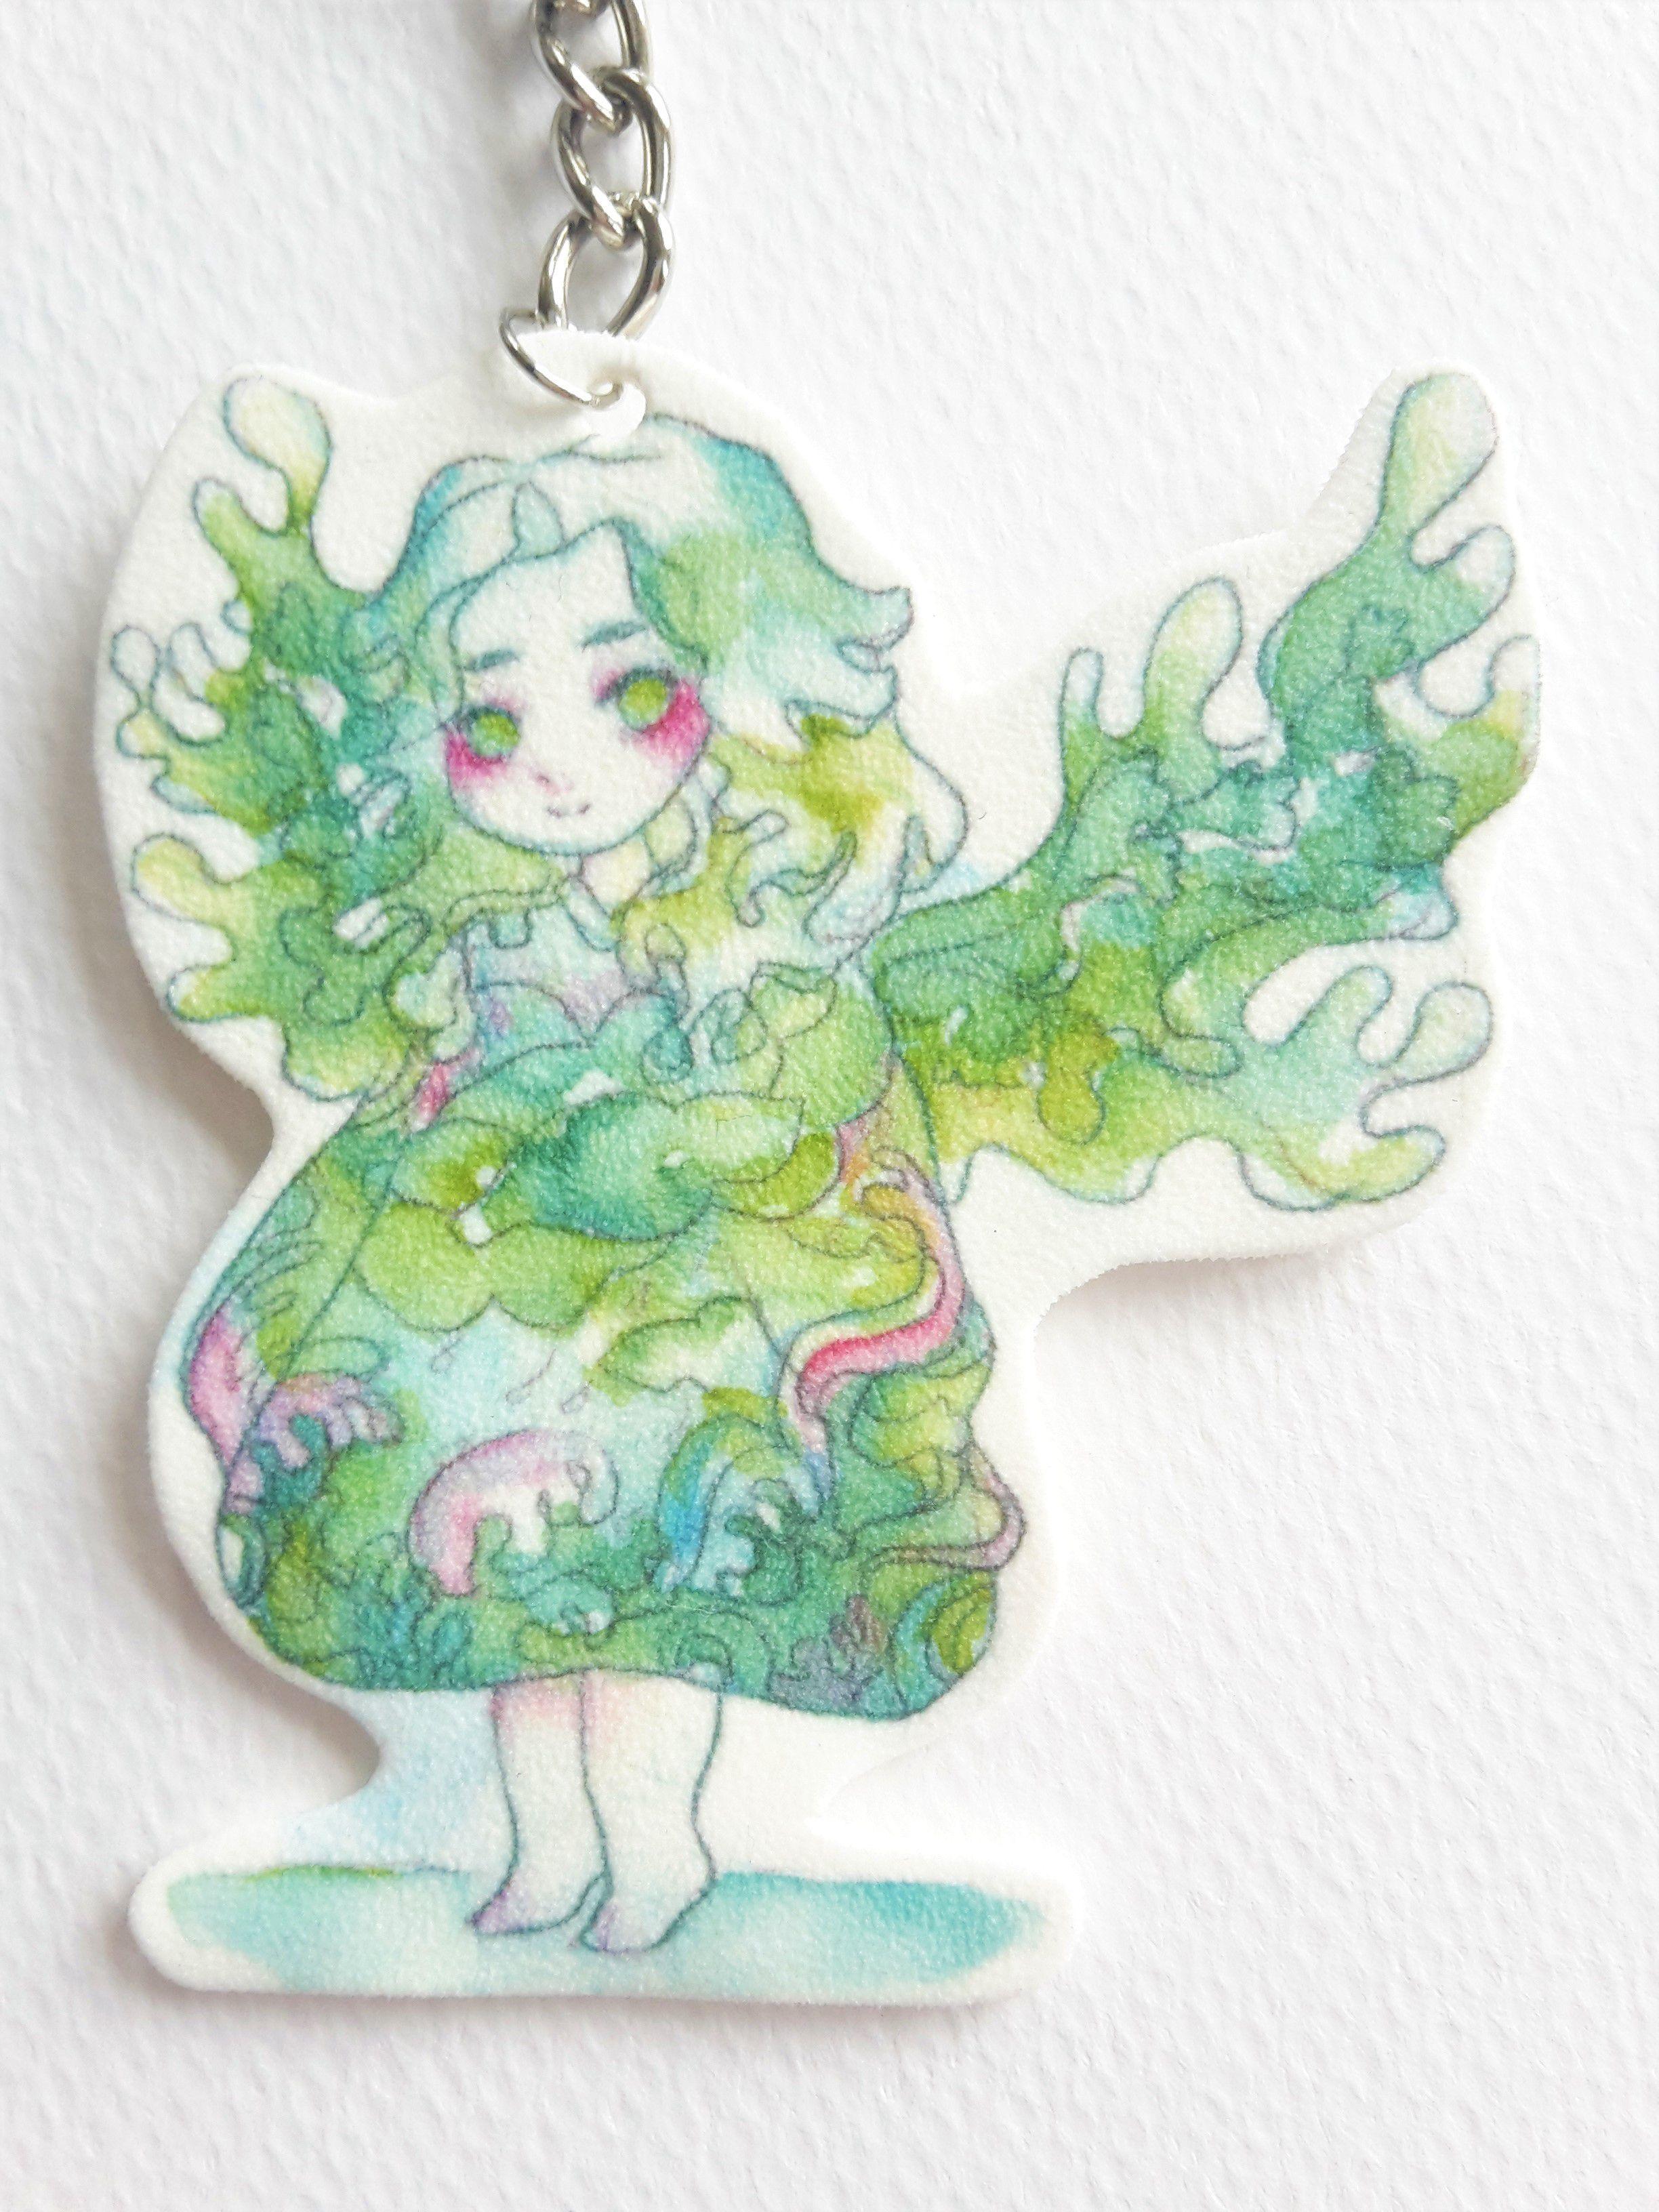 gift art cute angel charm keychain small fantasy anime manga adorable